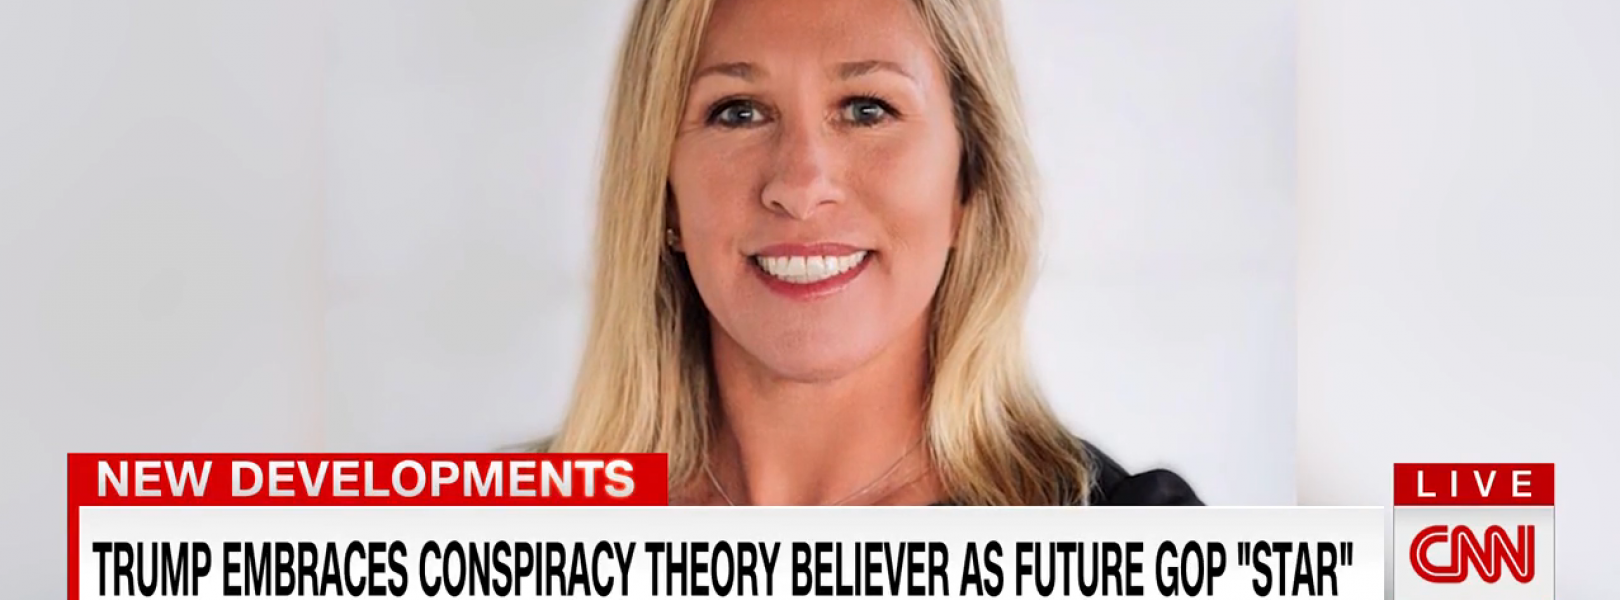 Marjorie Taylor Greene QAnon / Trump image from CNN